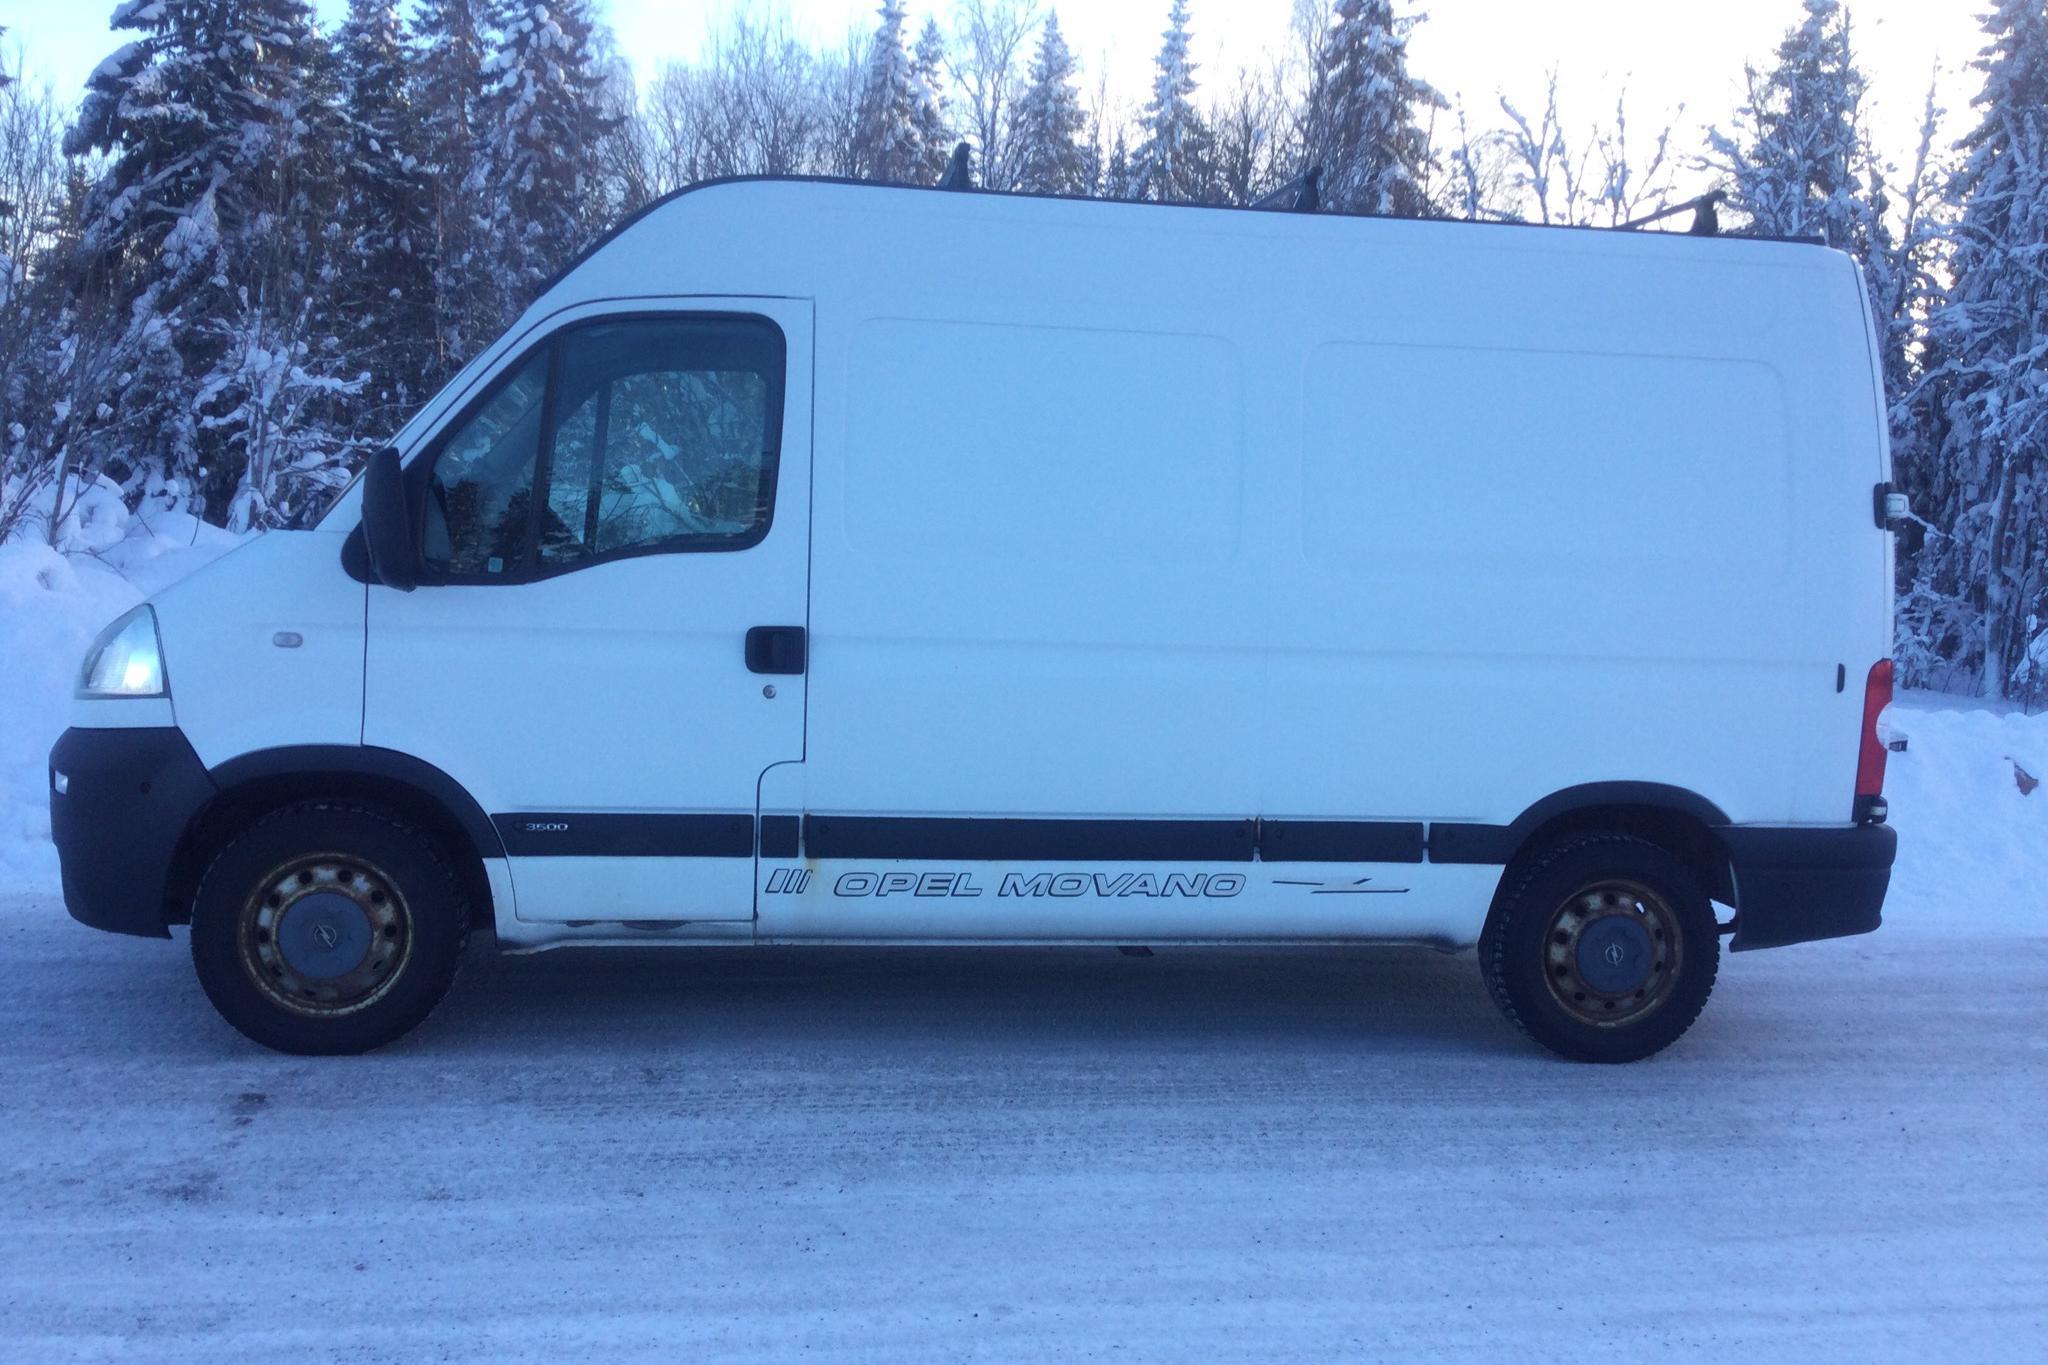 Opel Movano 2.5 CDTI Skåp (115hk) - 140 830 km - Manual - white - 2005